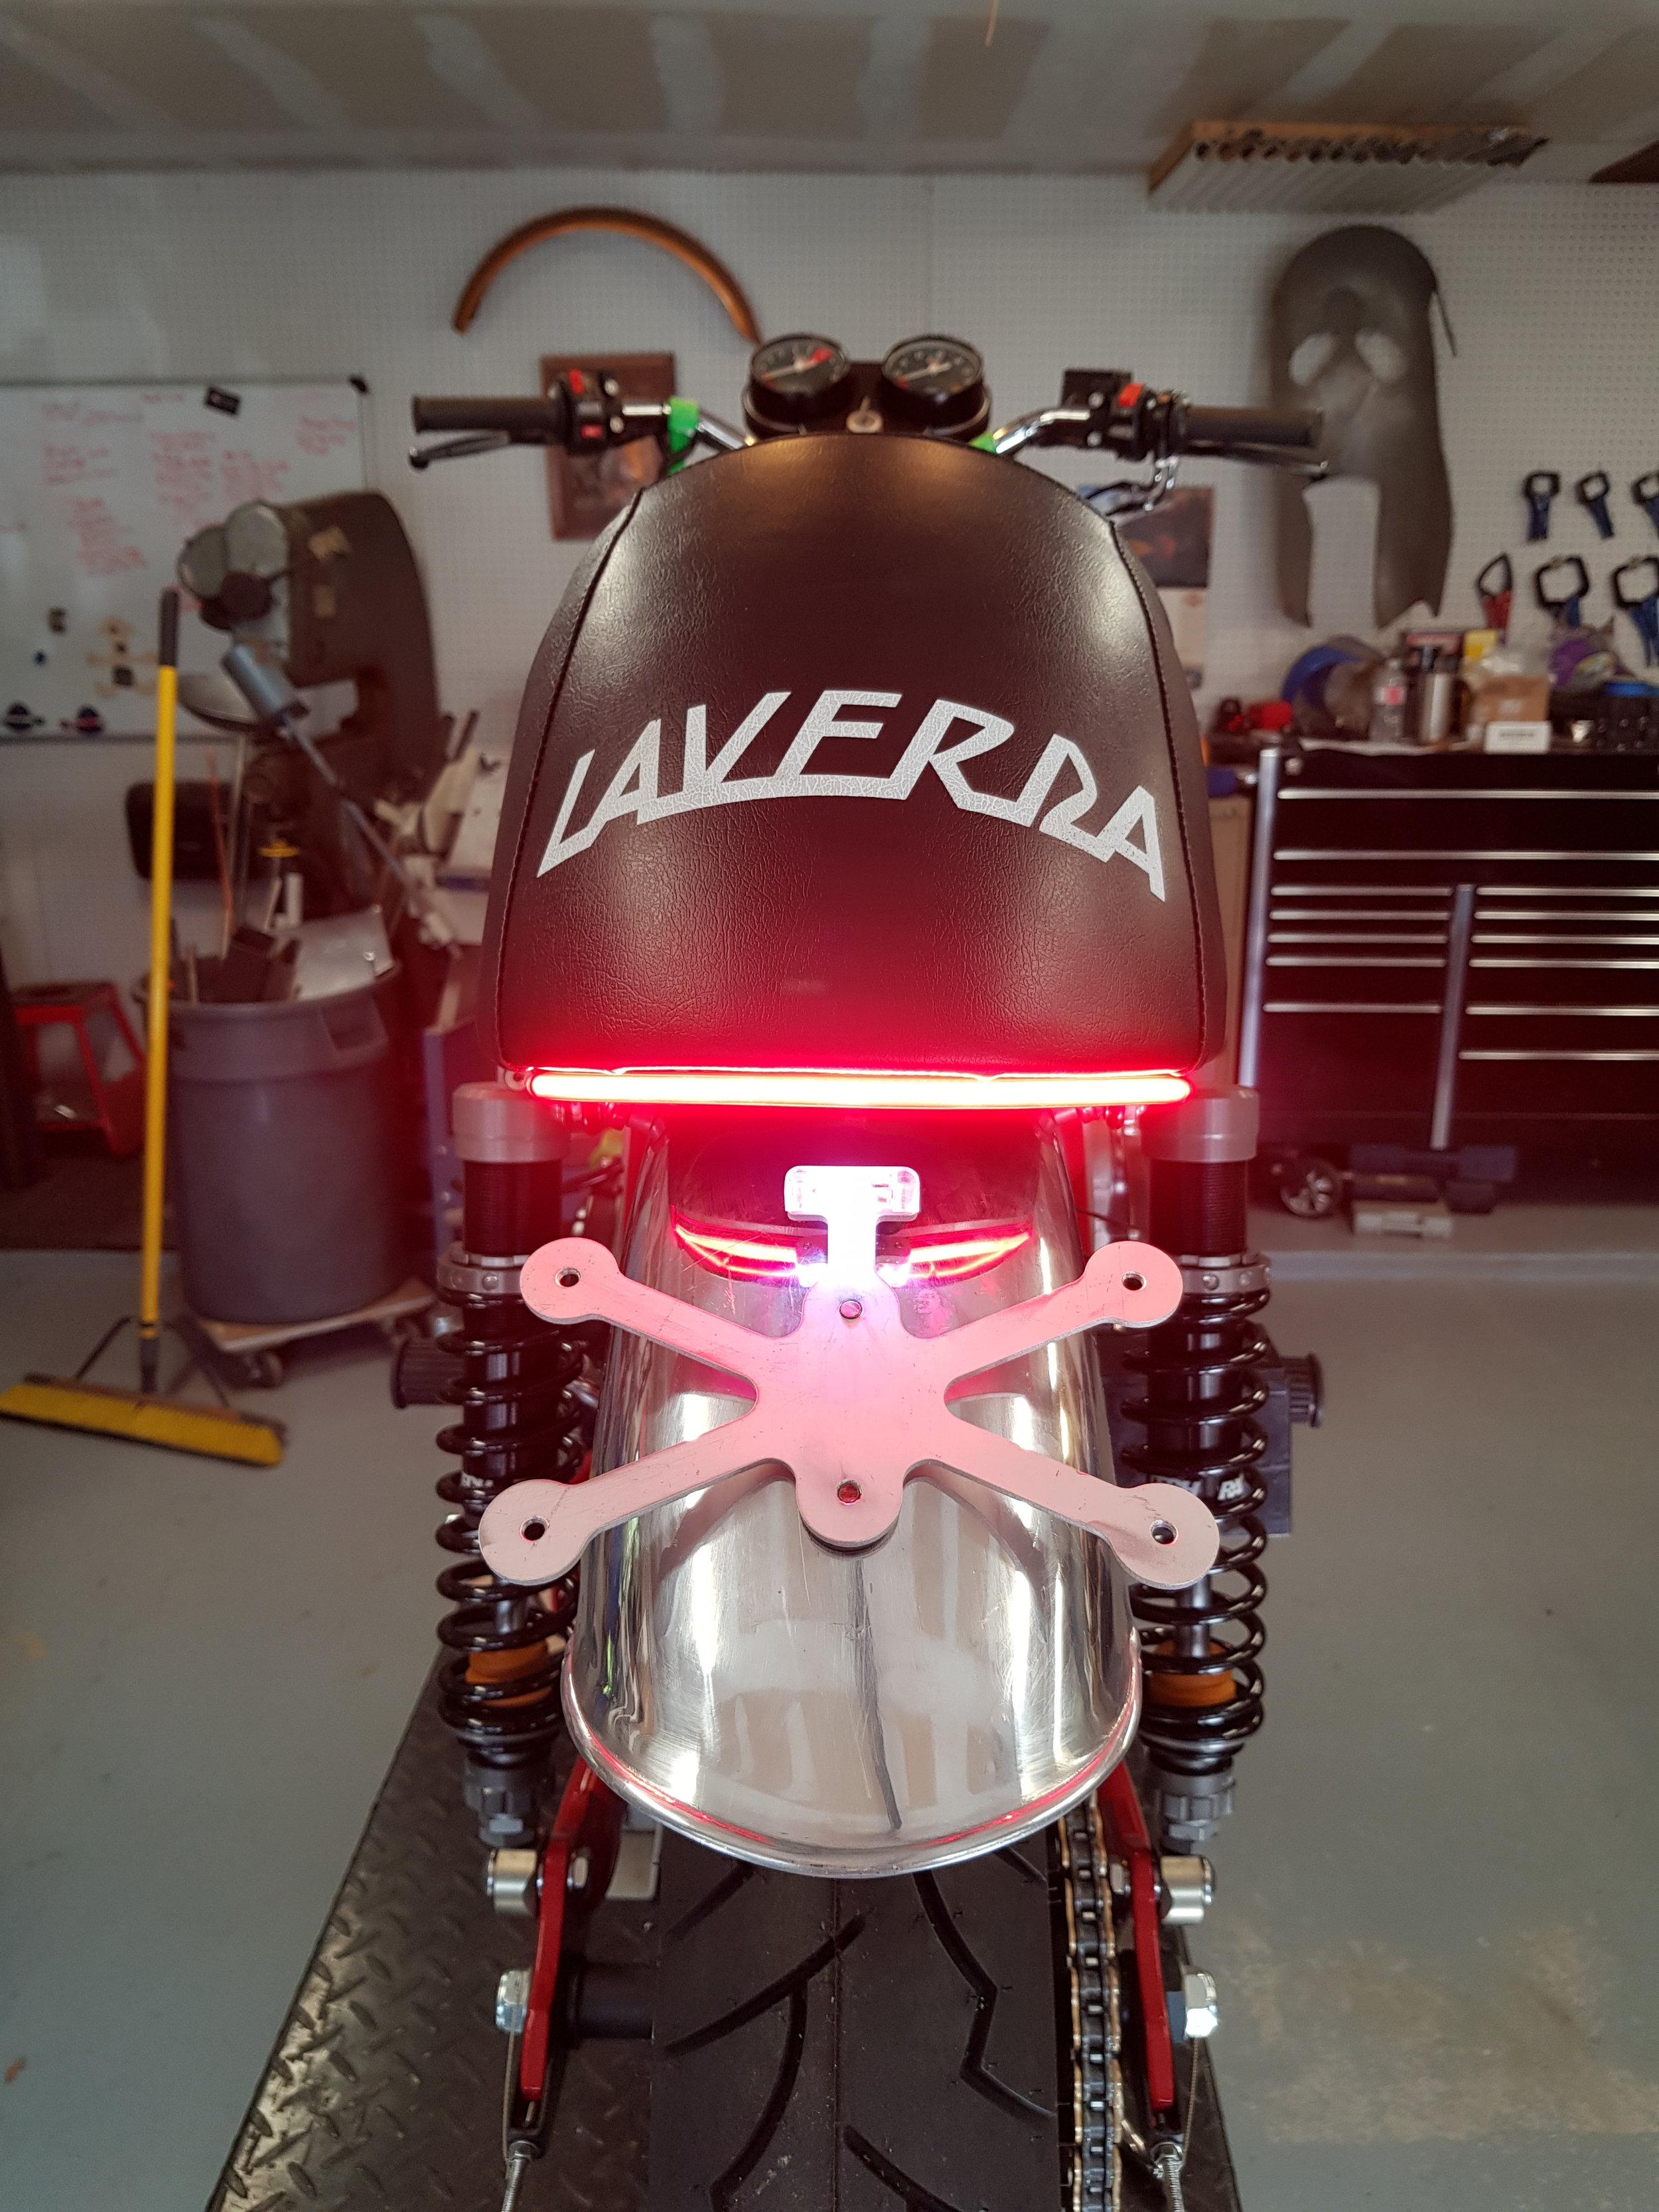 Laverda Tank and Tail Light